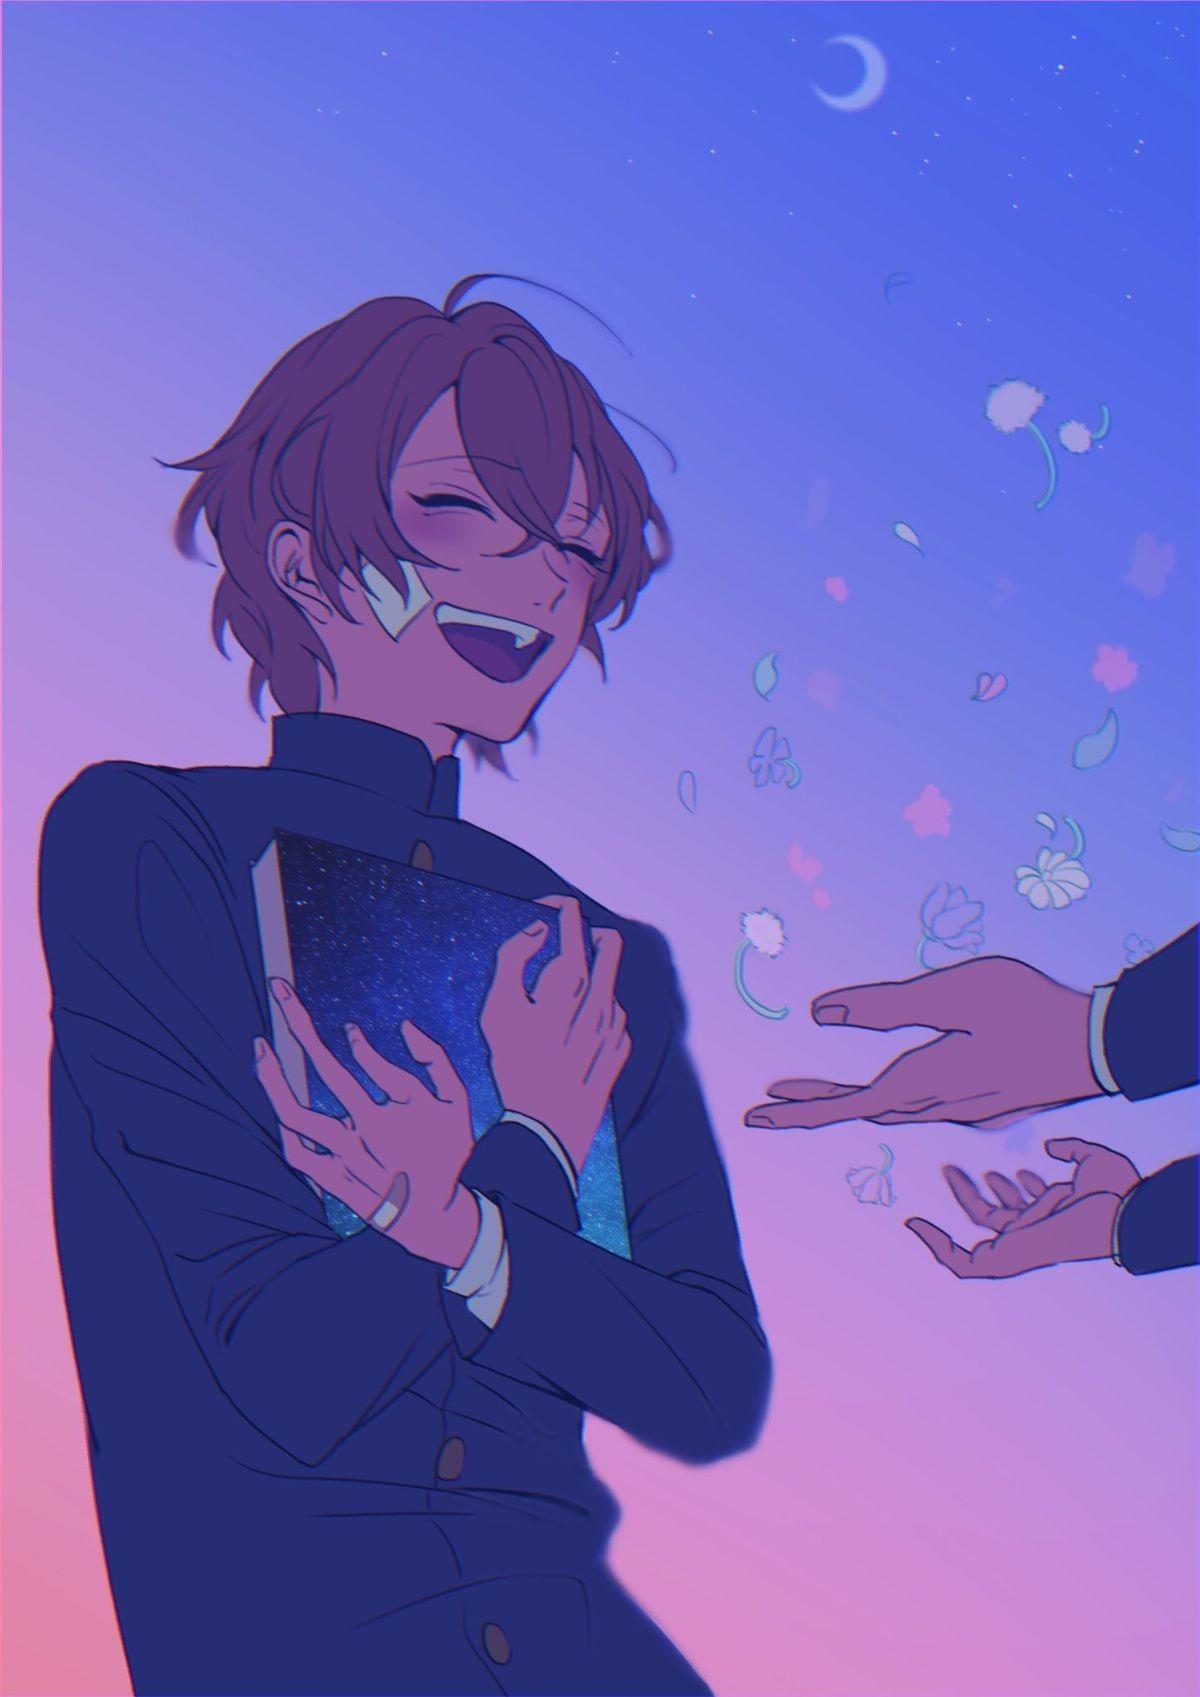 animeboy Aesthetic anime, Boy art, Anime art